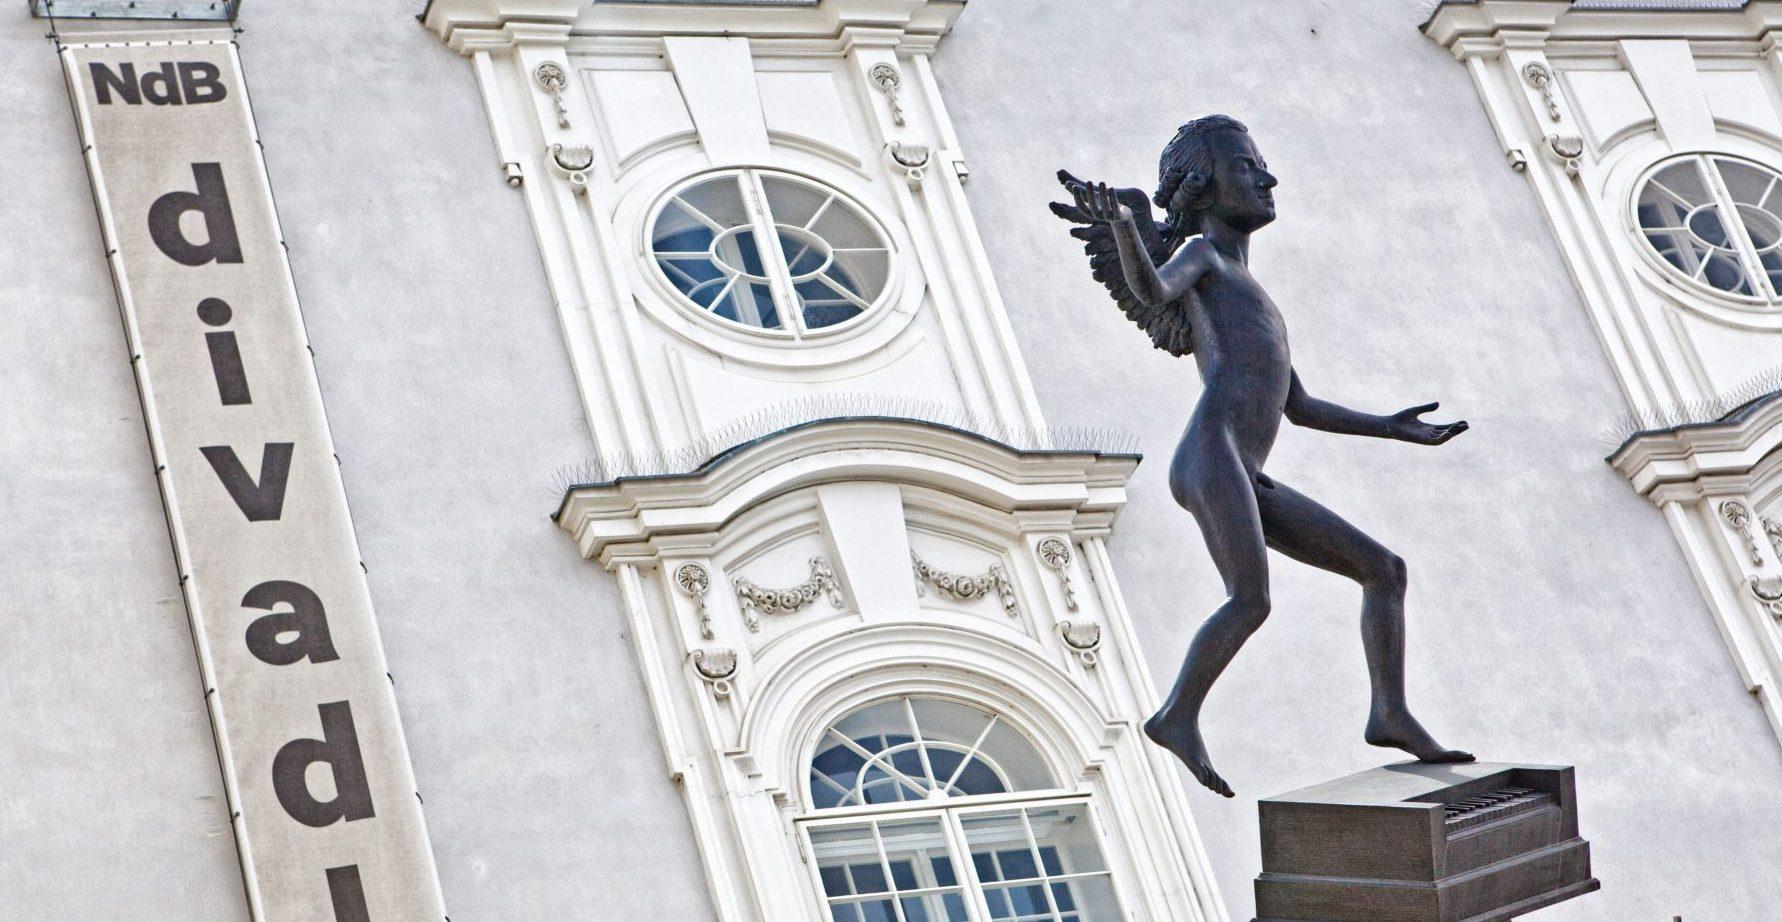 Zelný trh (Vegetable Market) in Brno, a statue of Mozart